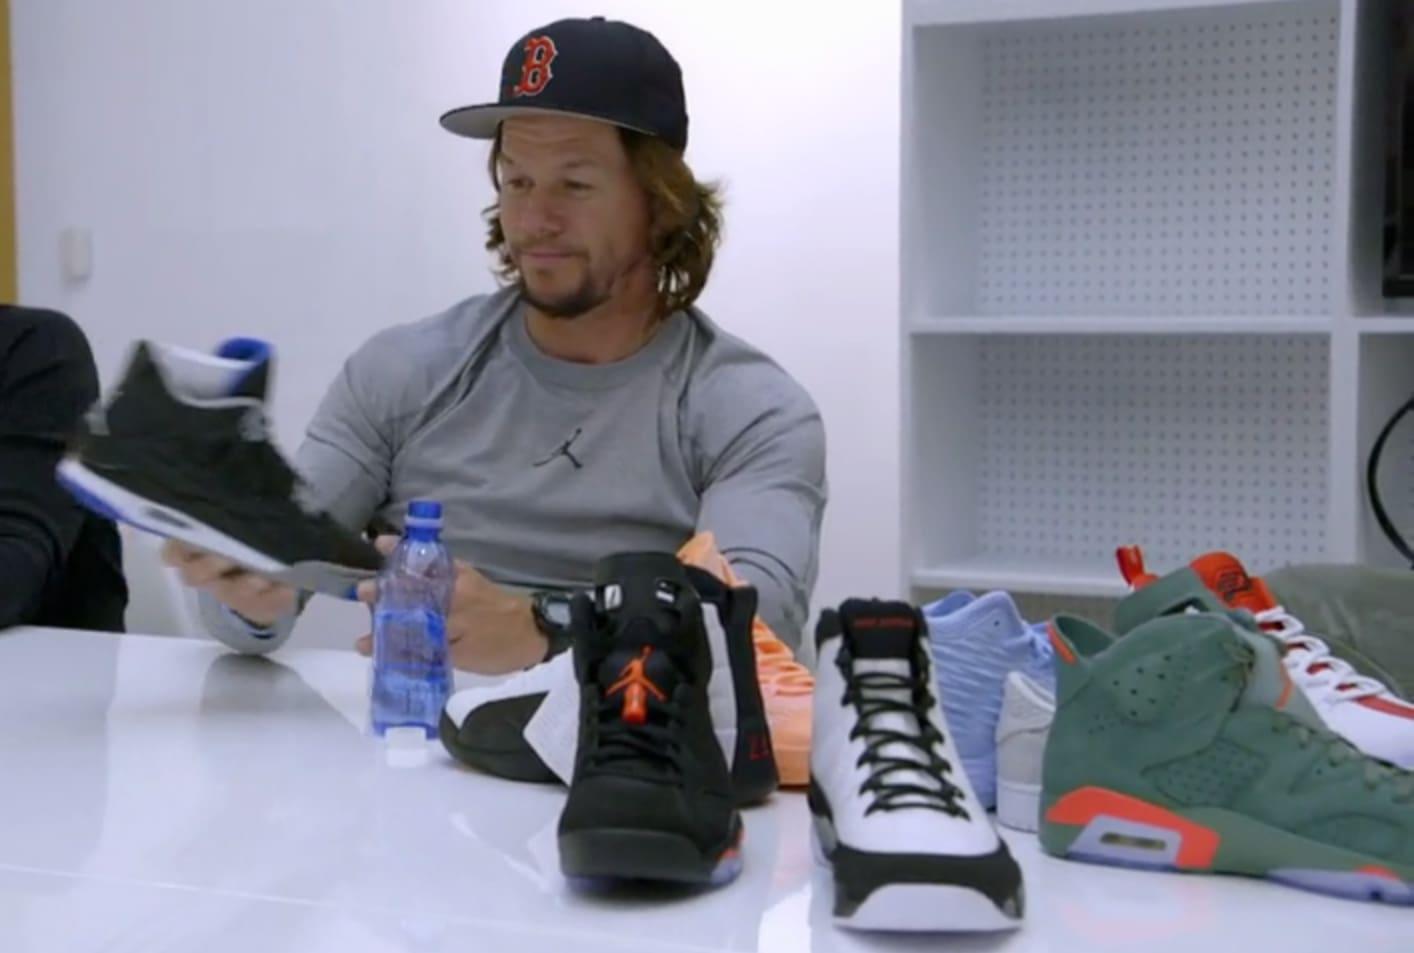 Sneaker L'hiverLe Air De 6 Pour Une Jordan Gatorade La Site nmwN80yPvO